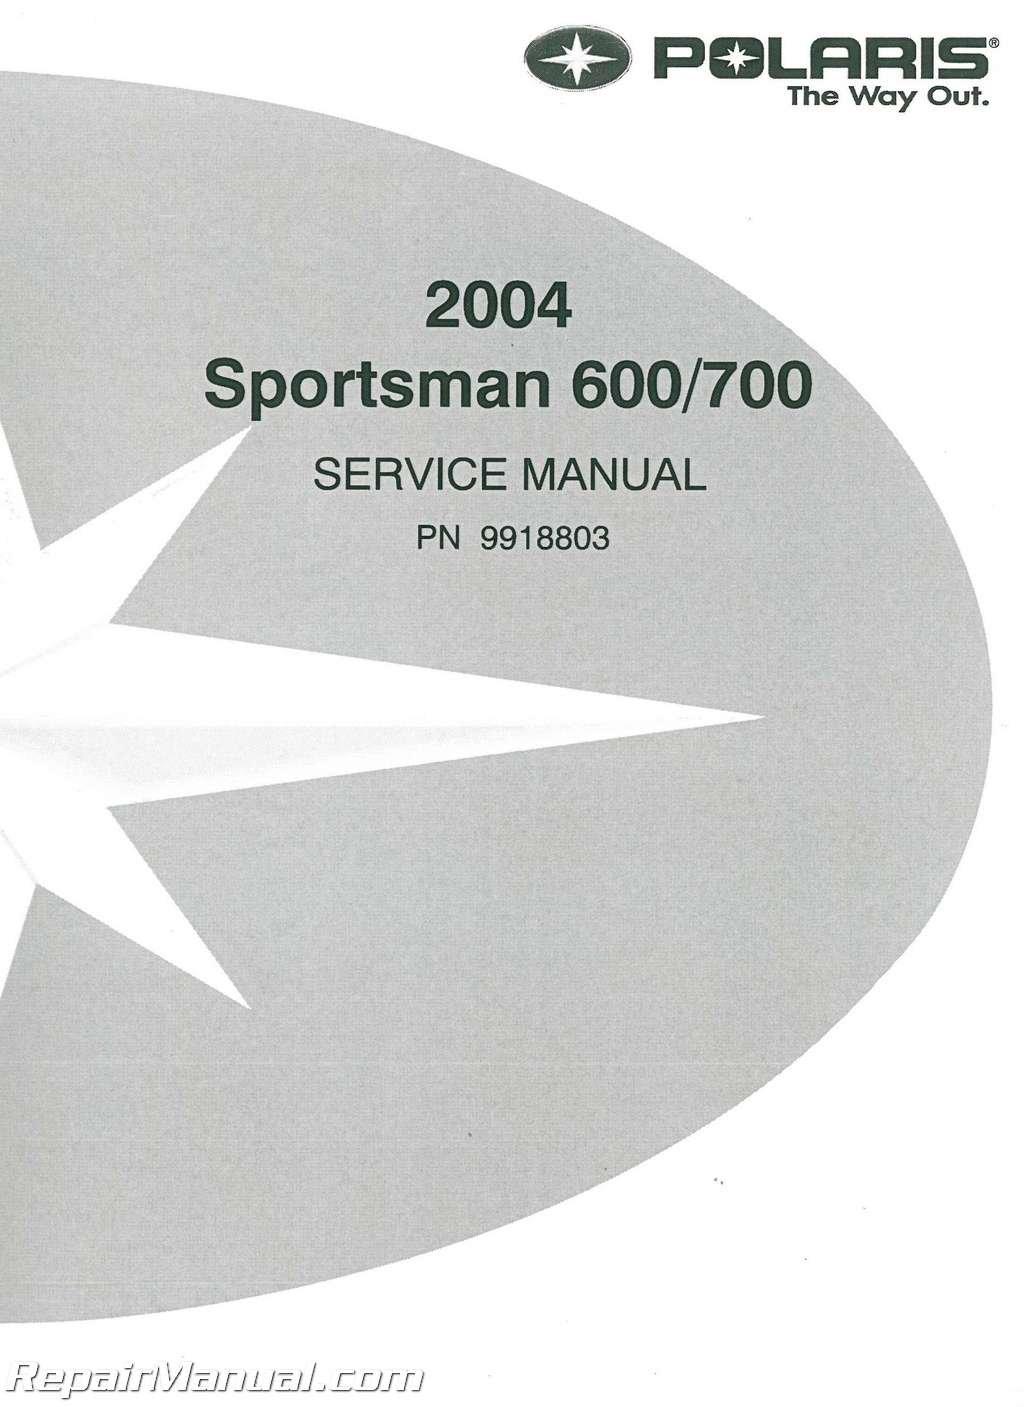 9918803 2004 Polaris Sportsman 600 700 Twin ATV Service Manual:  Manufacturer: Amazon.com: Books